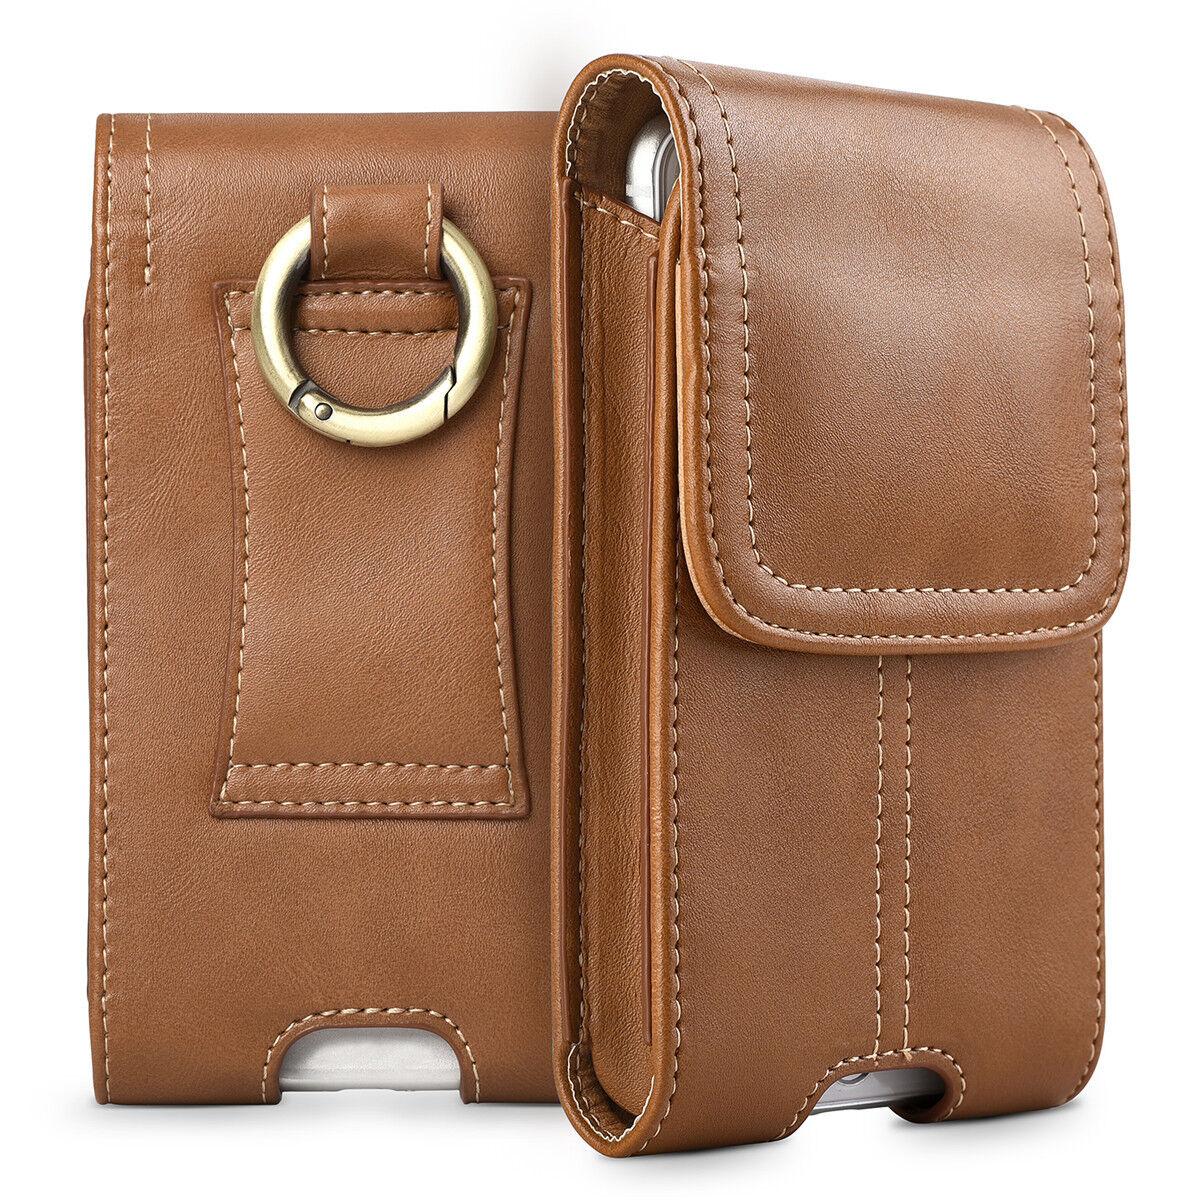 innovative design 49f86 38da5 Details about Business Men Vertical Leather Cell Phone Pouch Case Holster  Belt Loop Holder US